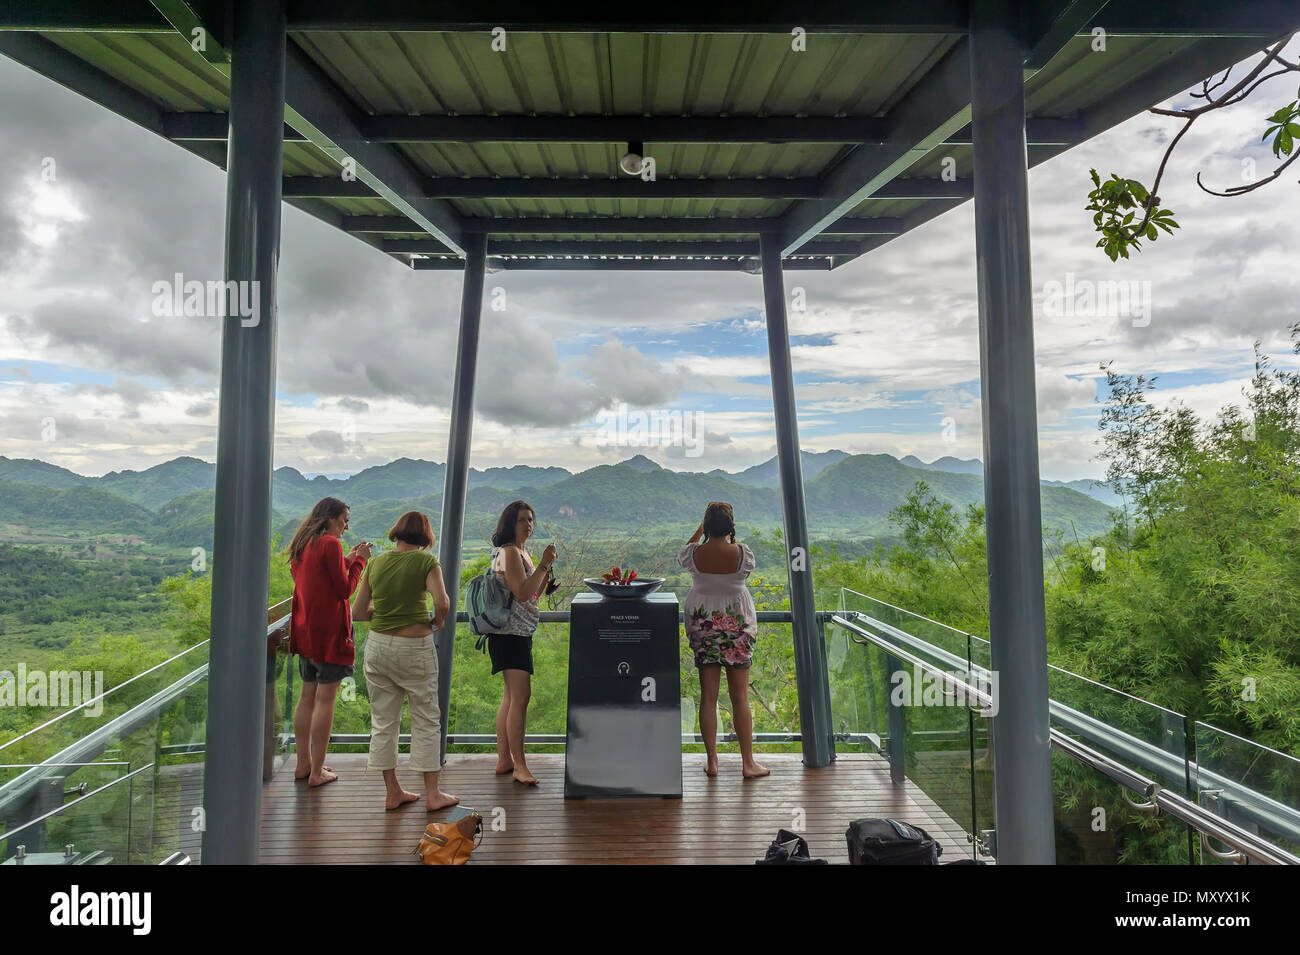 Musée commémoratif de l'Hellfire Pass, la province de Kanchanaburi, Thaïlande Banque D'Images